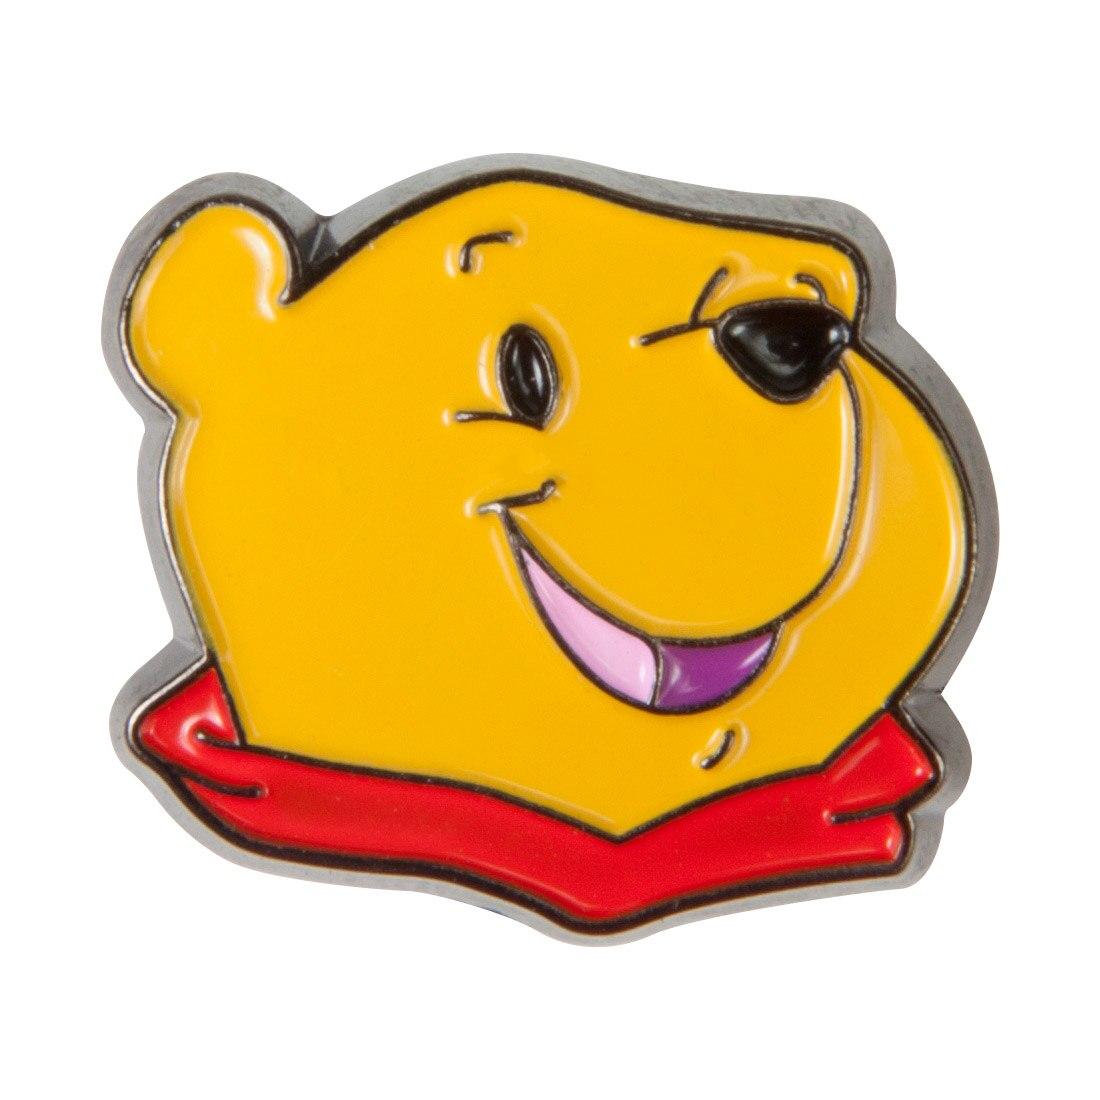 Disney Enamel Dawg Tags Shoe Charms - Winnie The Pooh (C1023) winnie the pooh